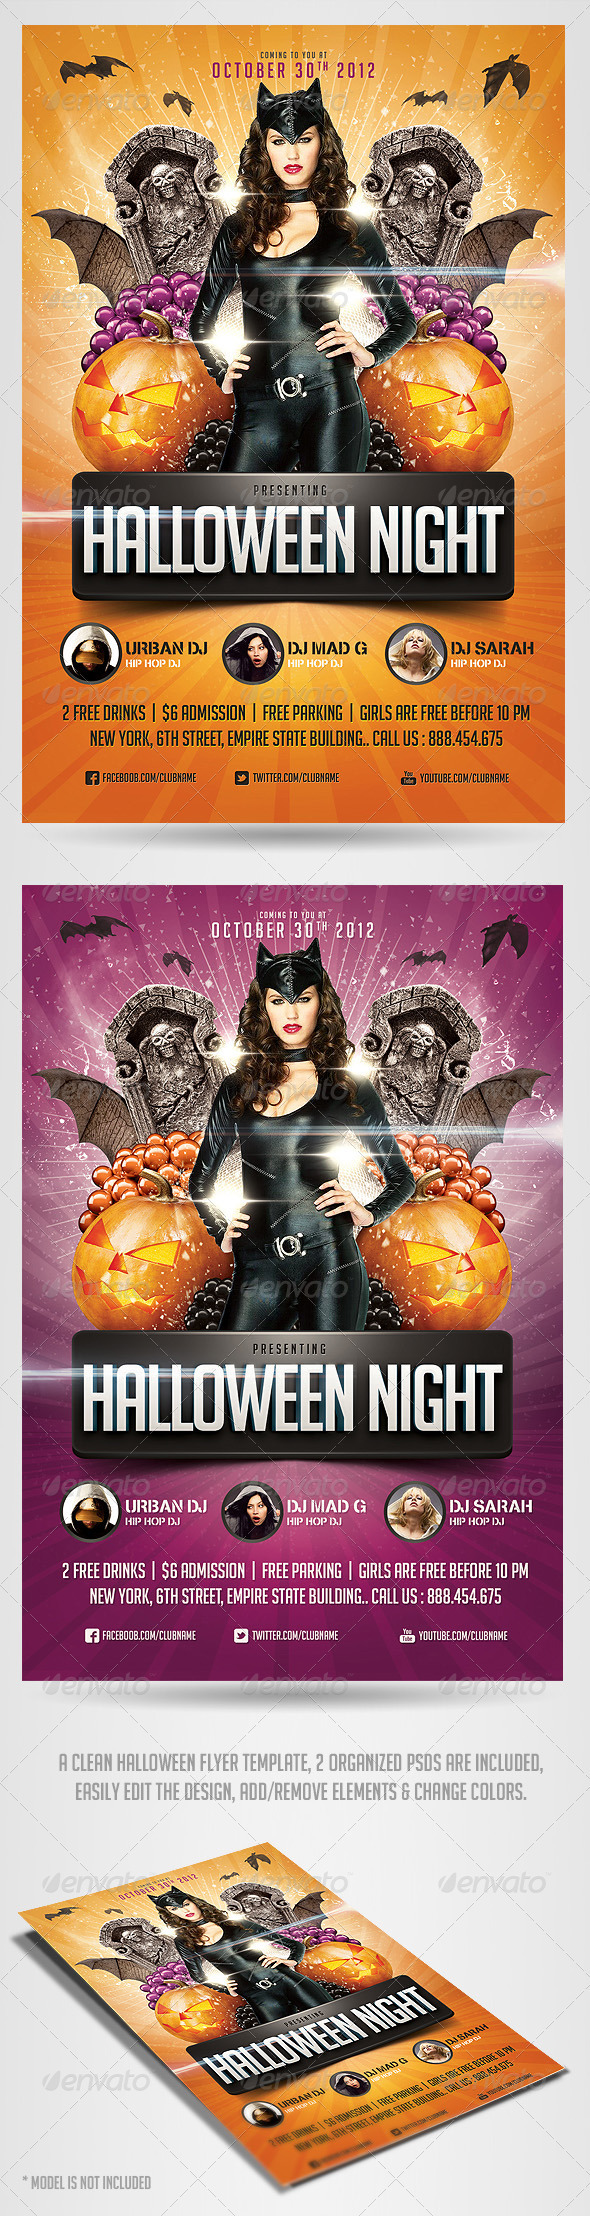 GraphicRiver Halloween Night Flyer Template 2997746